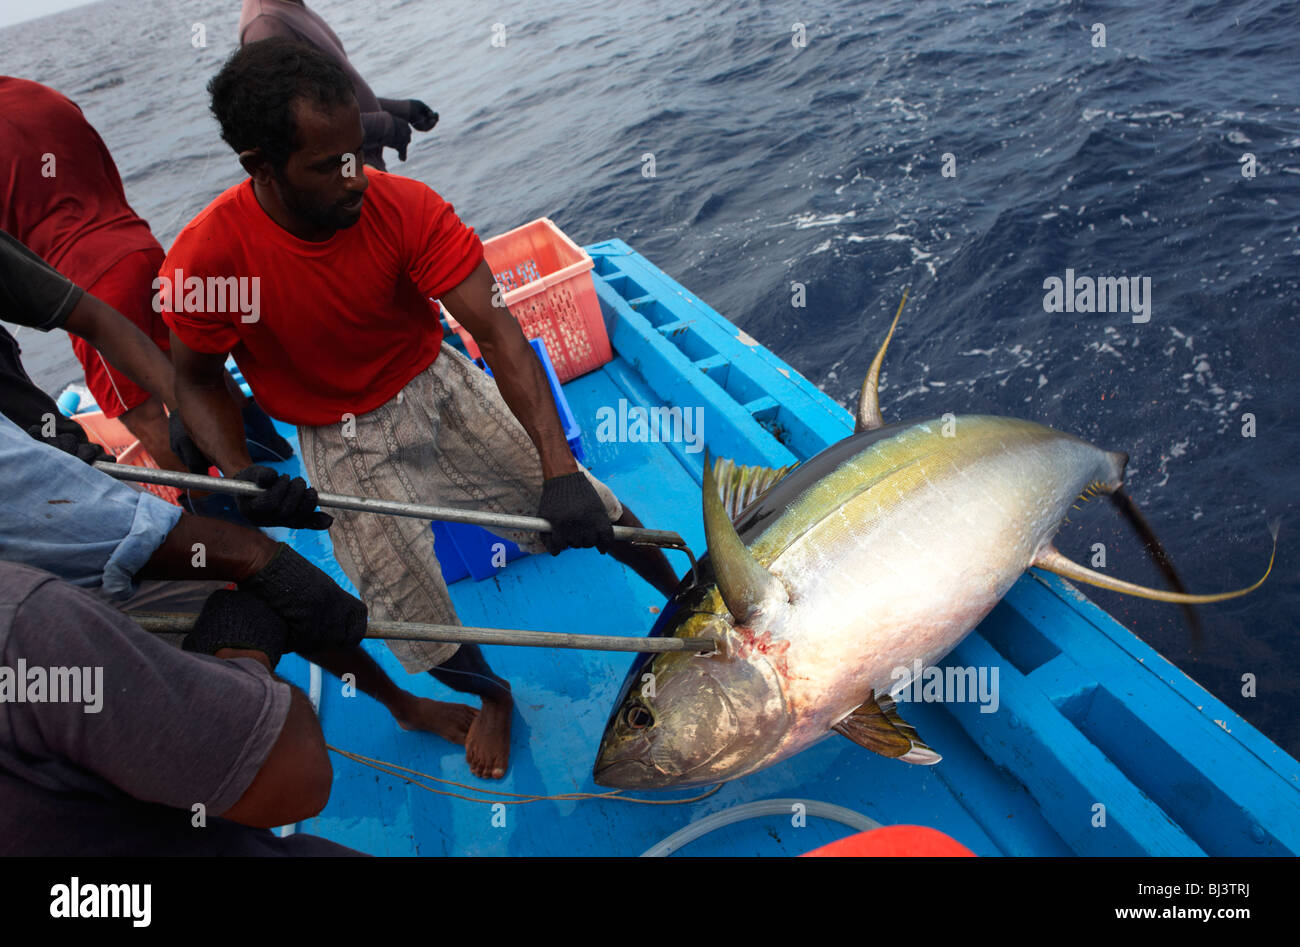 fishermen-from-the-maldives-haul-aboard-